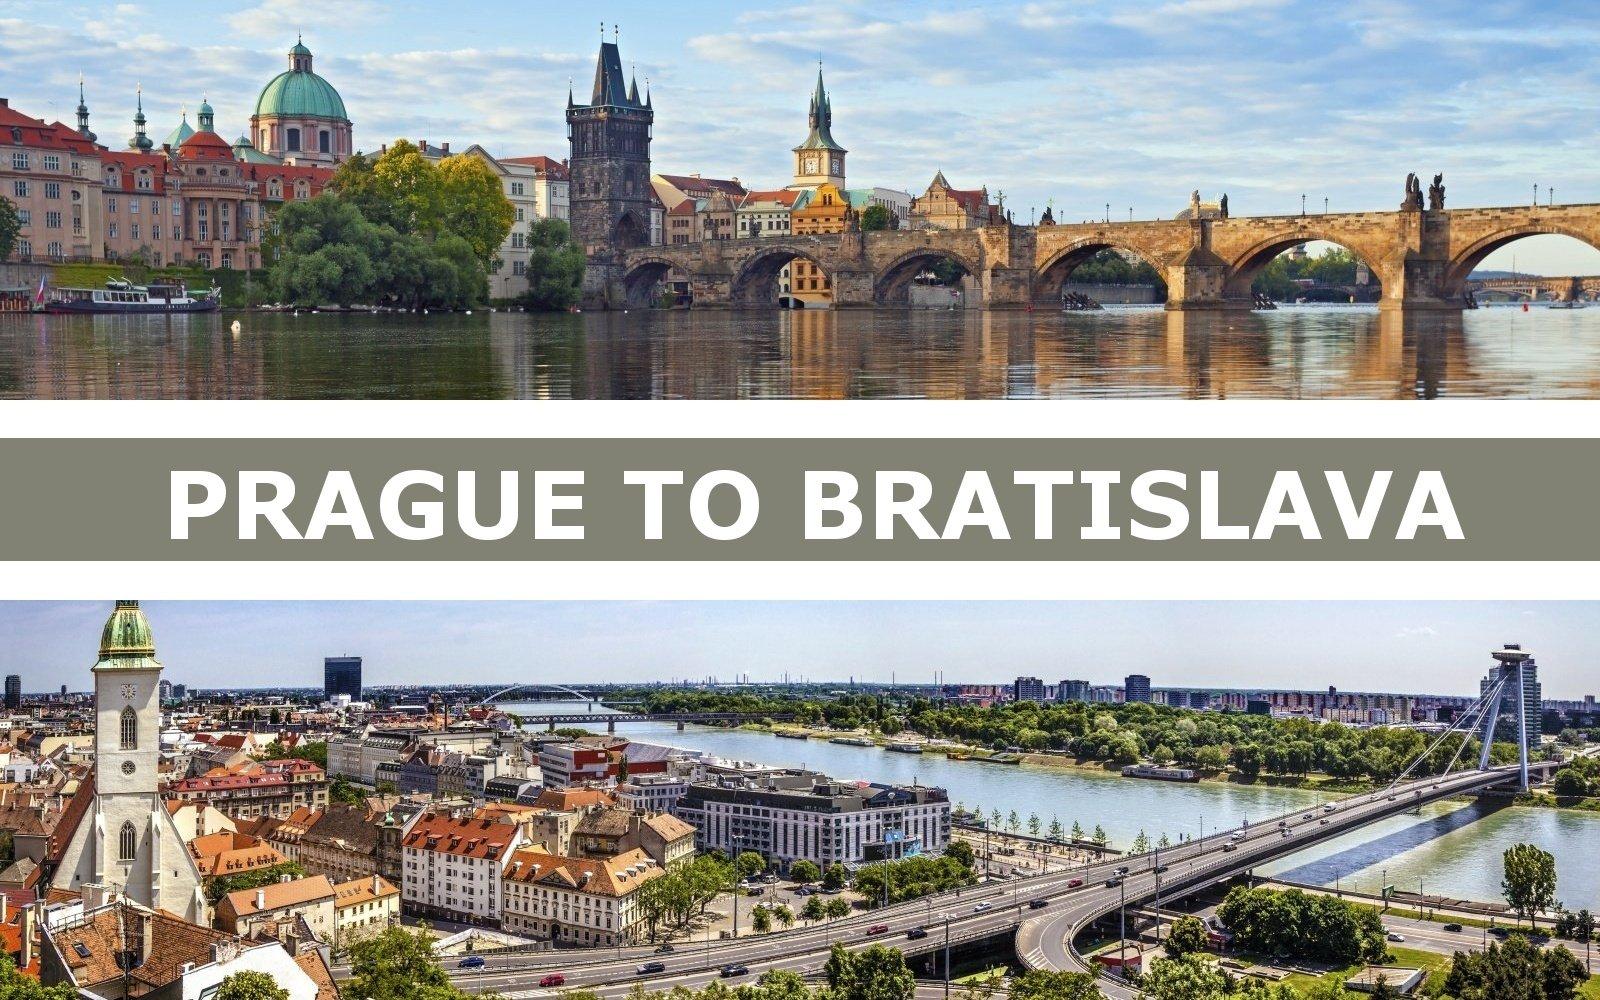 Taxi transfer from Prague to Bratislava